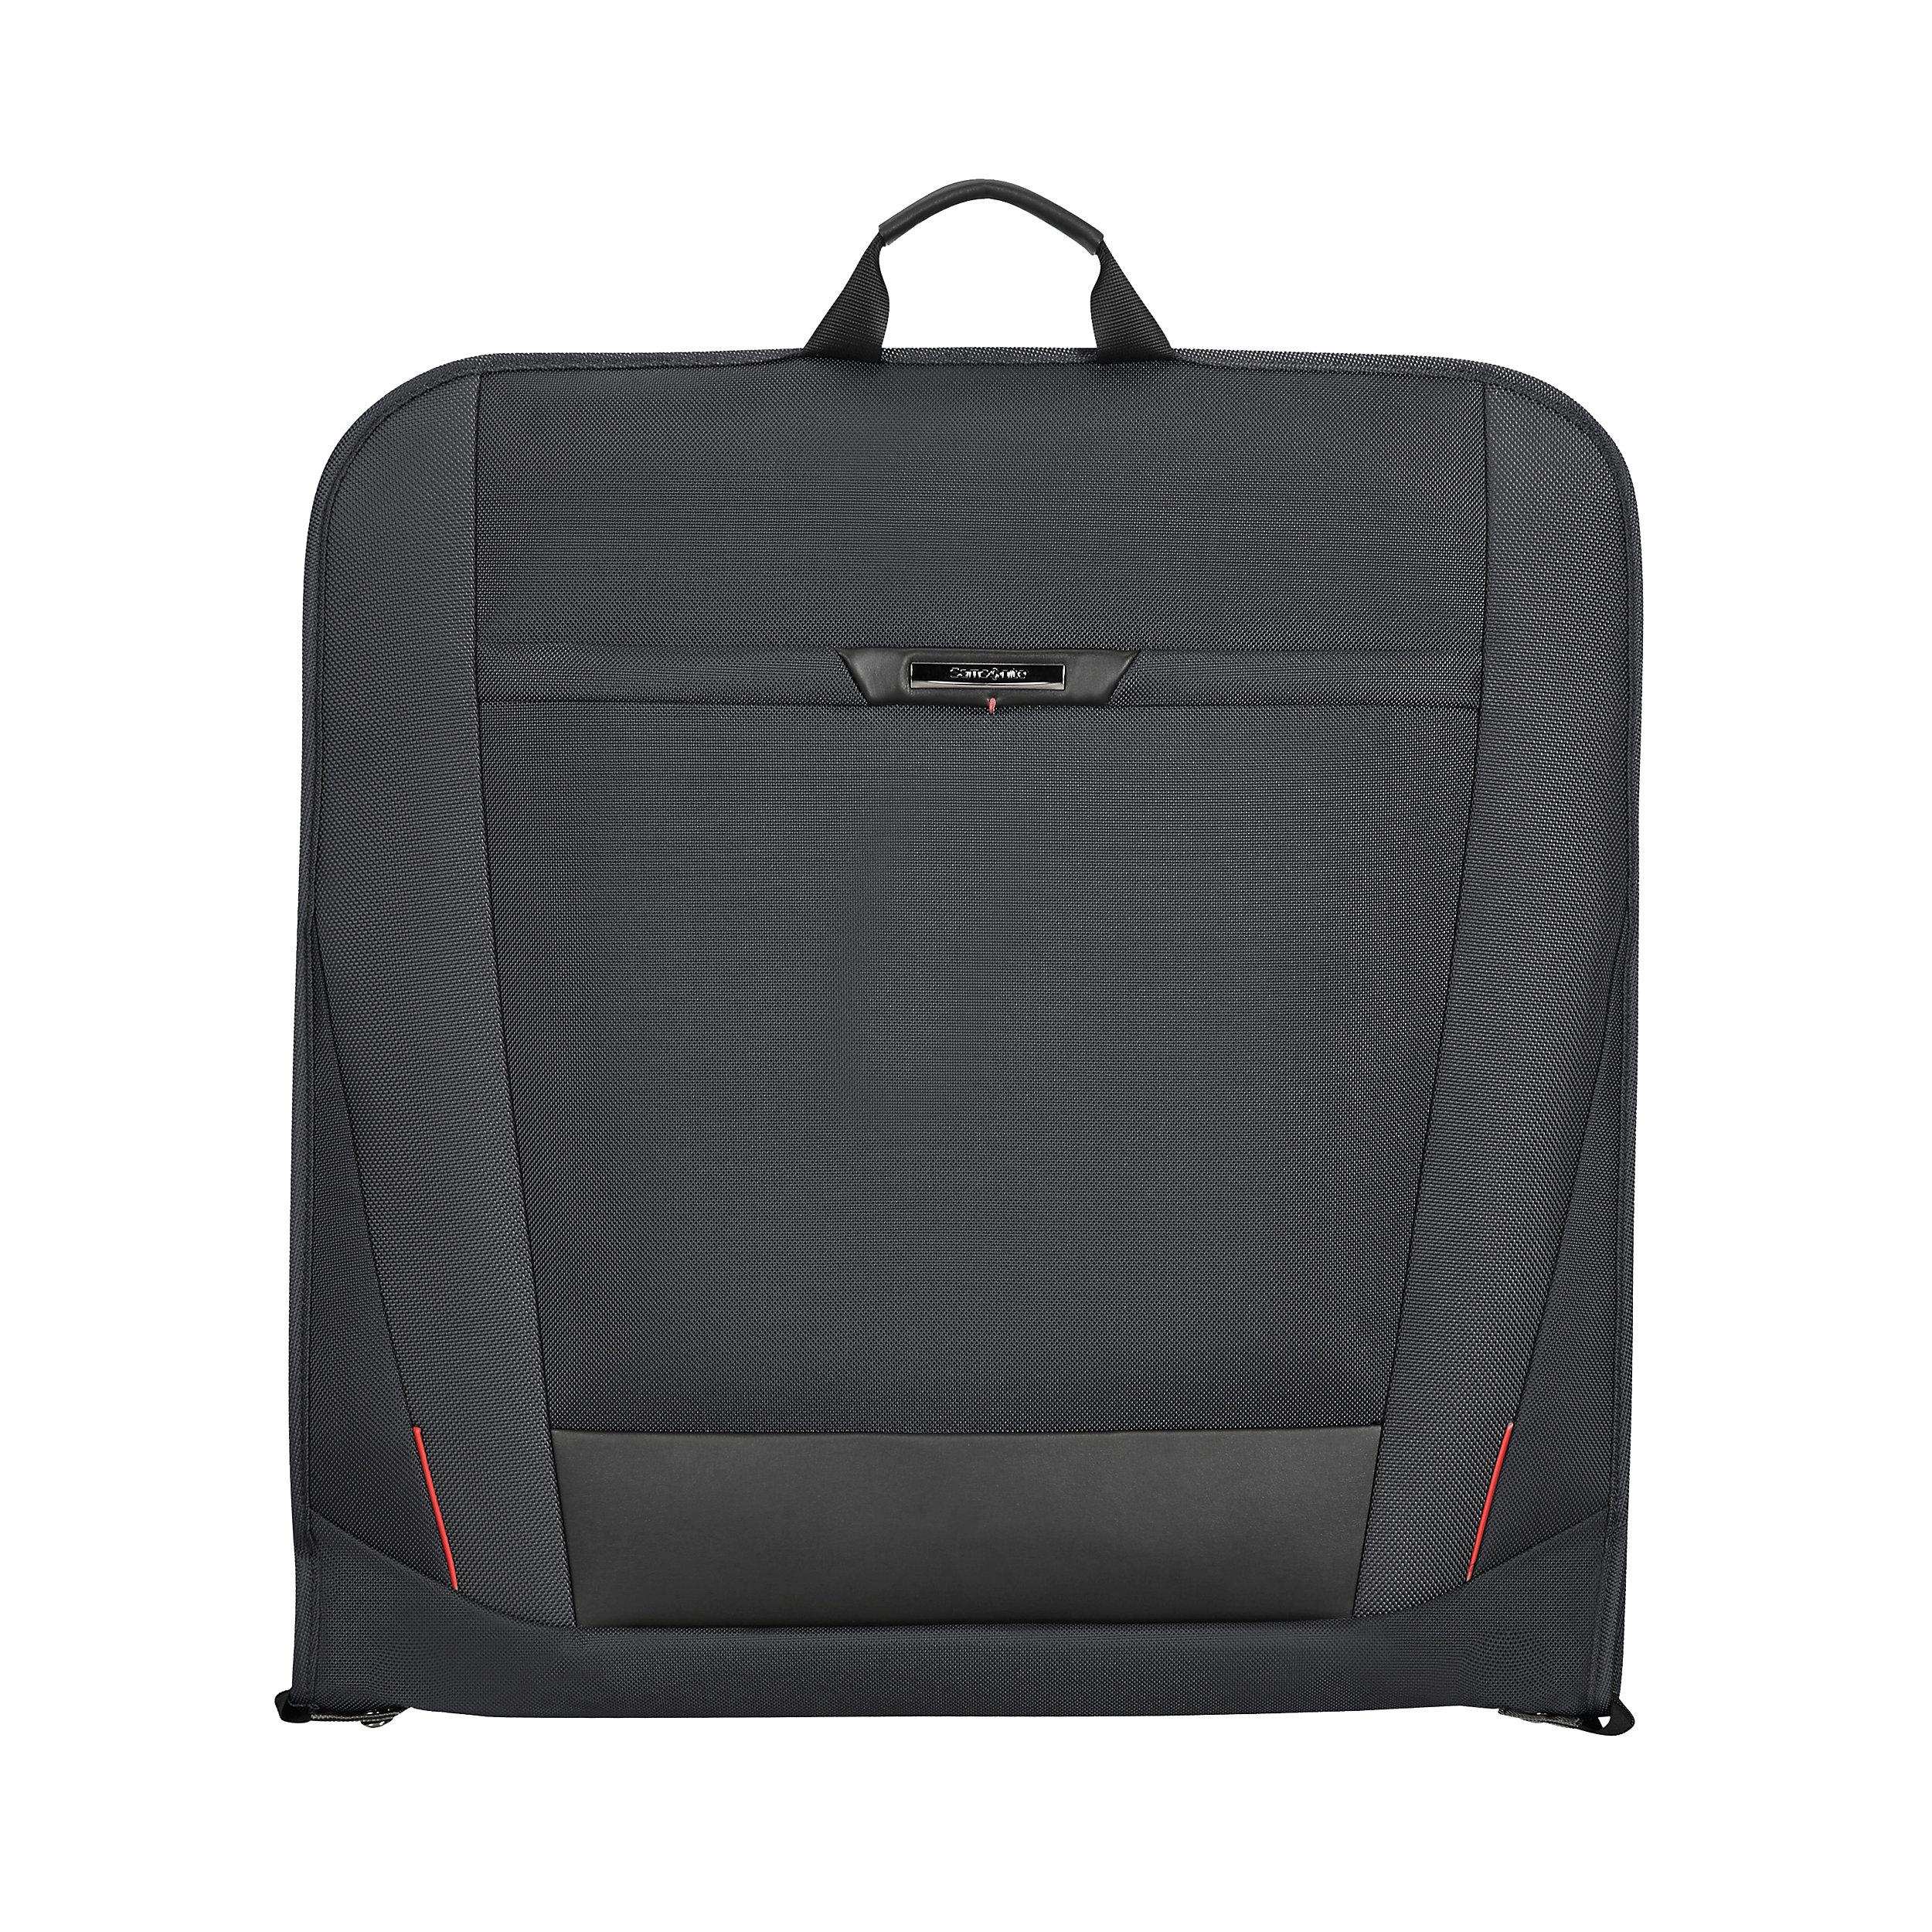 Kleiderhülle Garment Sleeve Pro-DLX5